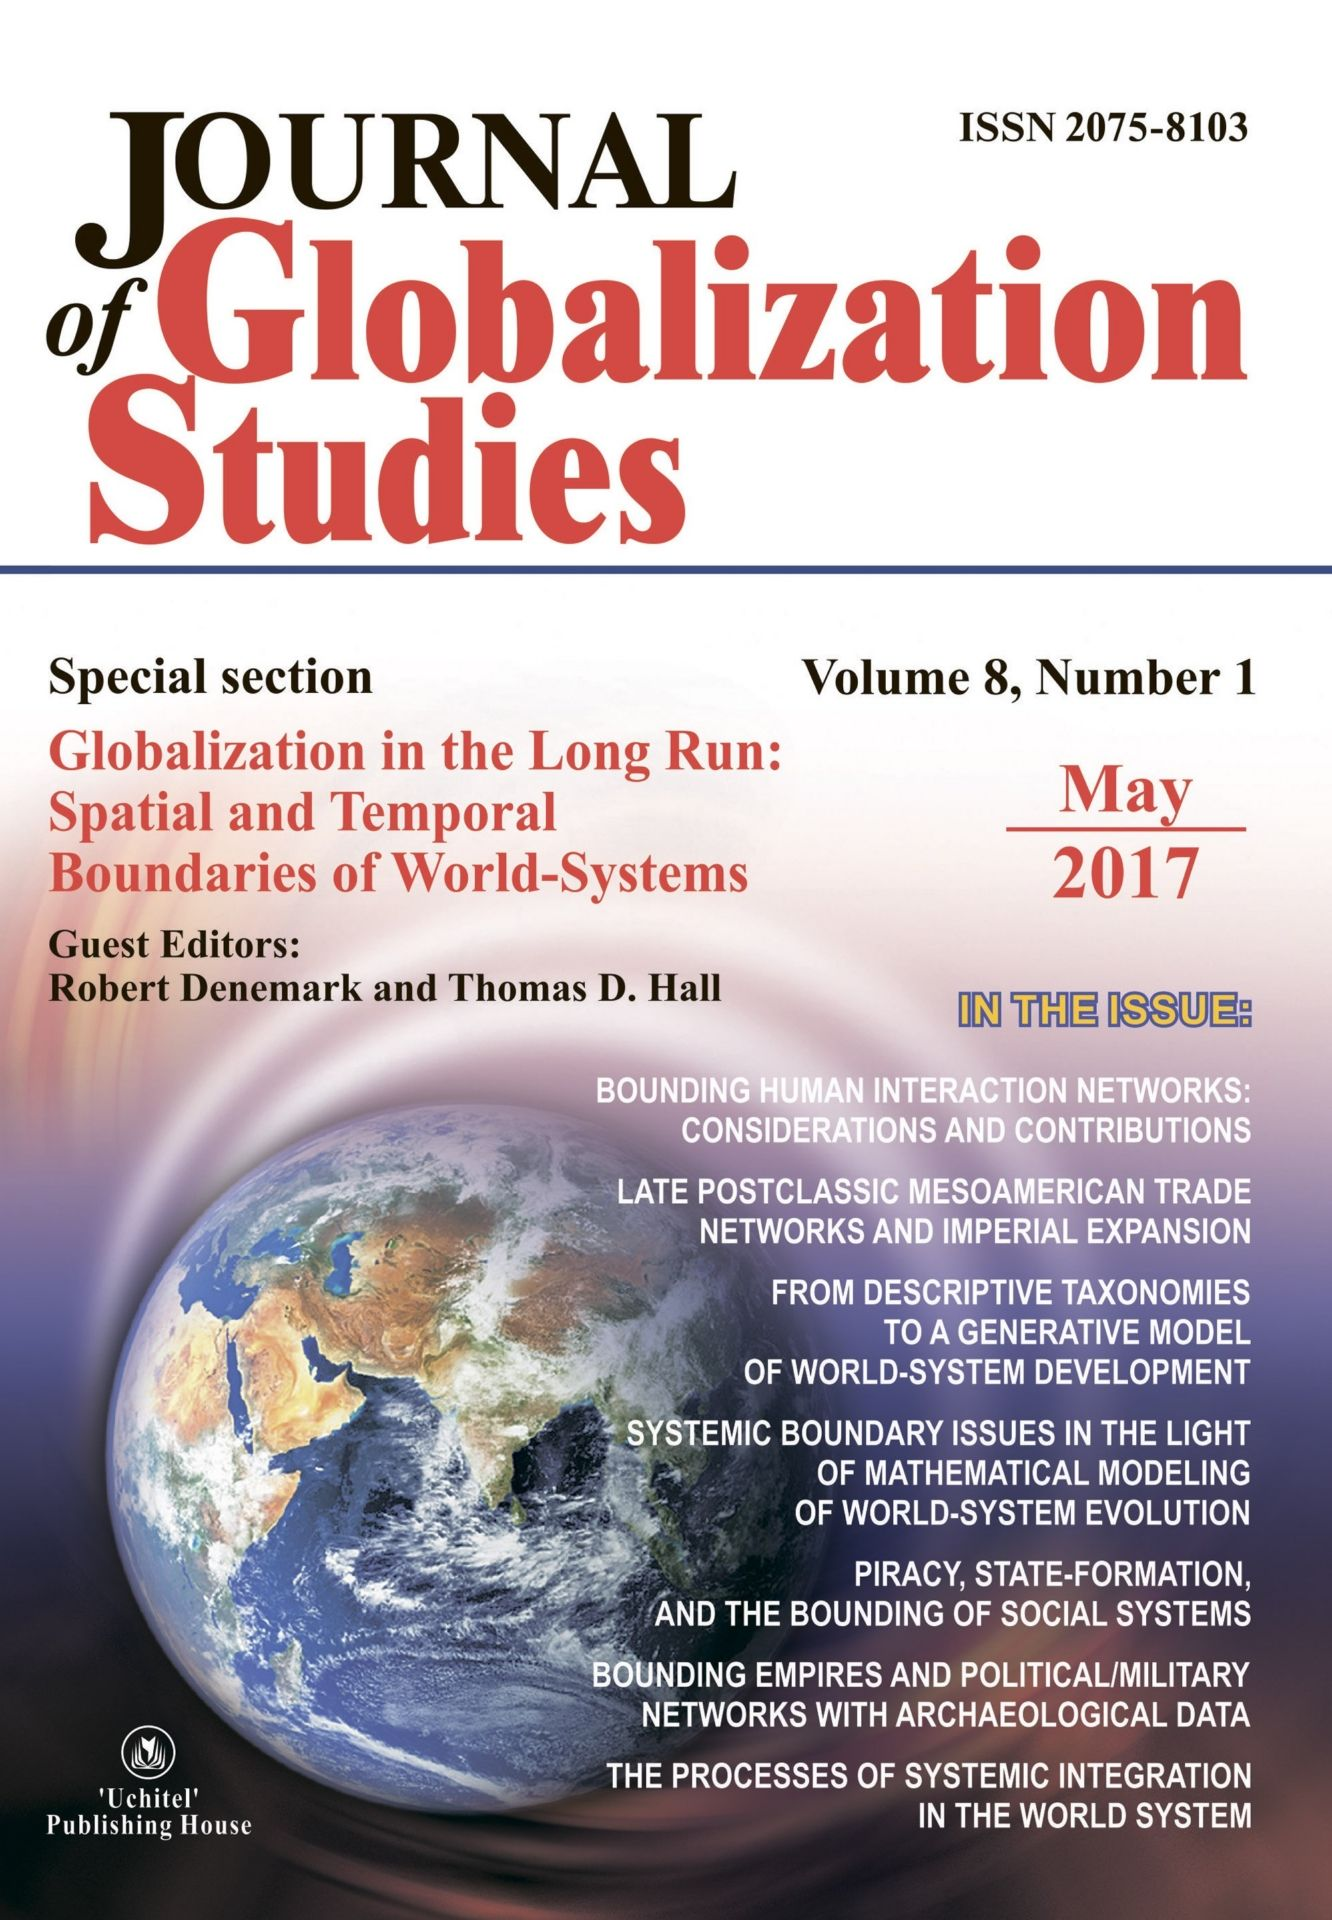 Journal of Globalization Studies Volume 8, Number 1, 2017 г. Журнал глобализационных исследований Международный журнал на английском языке